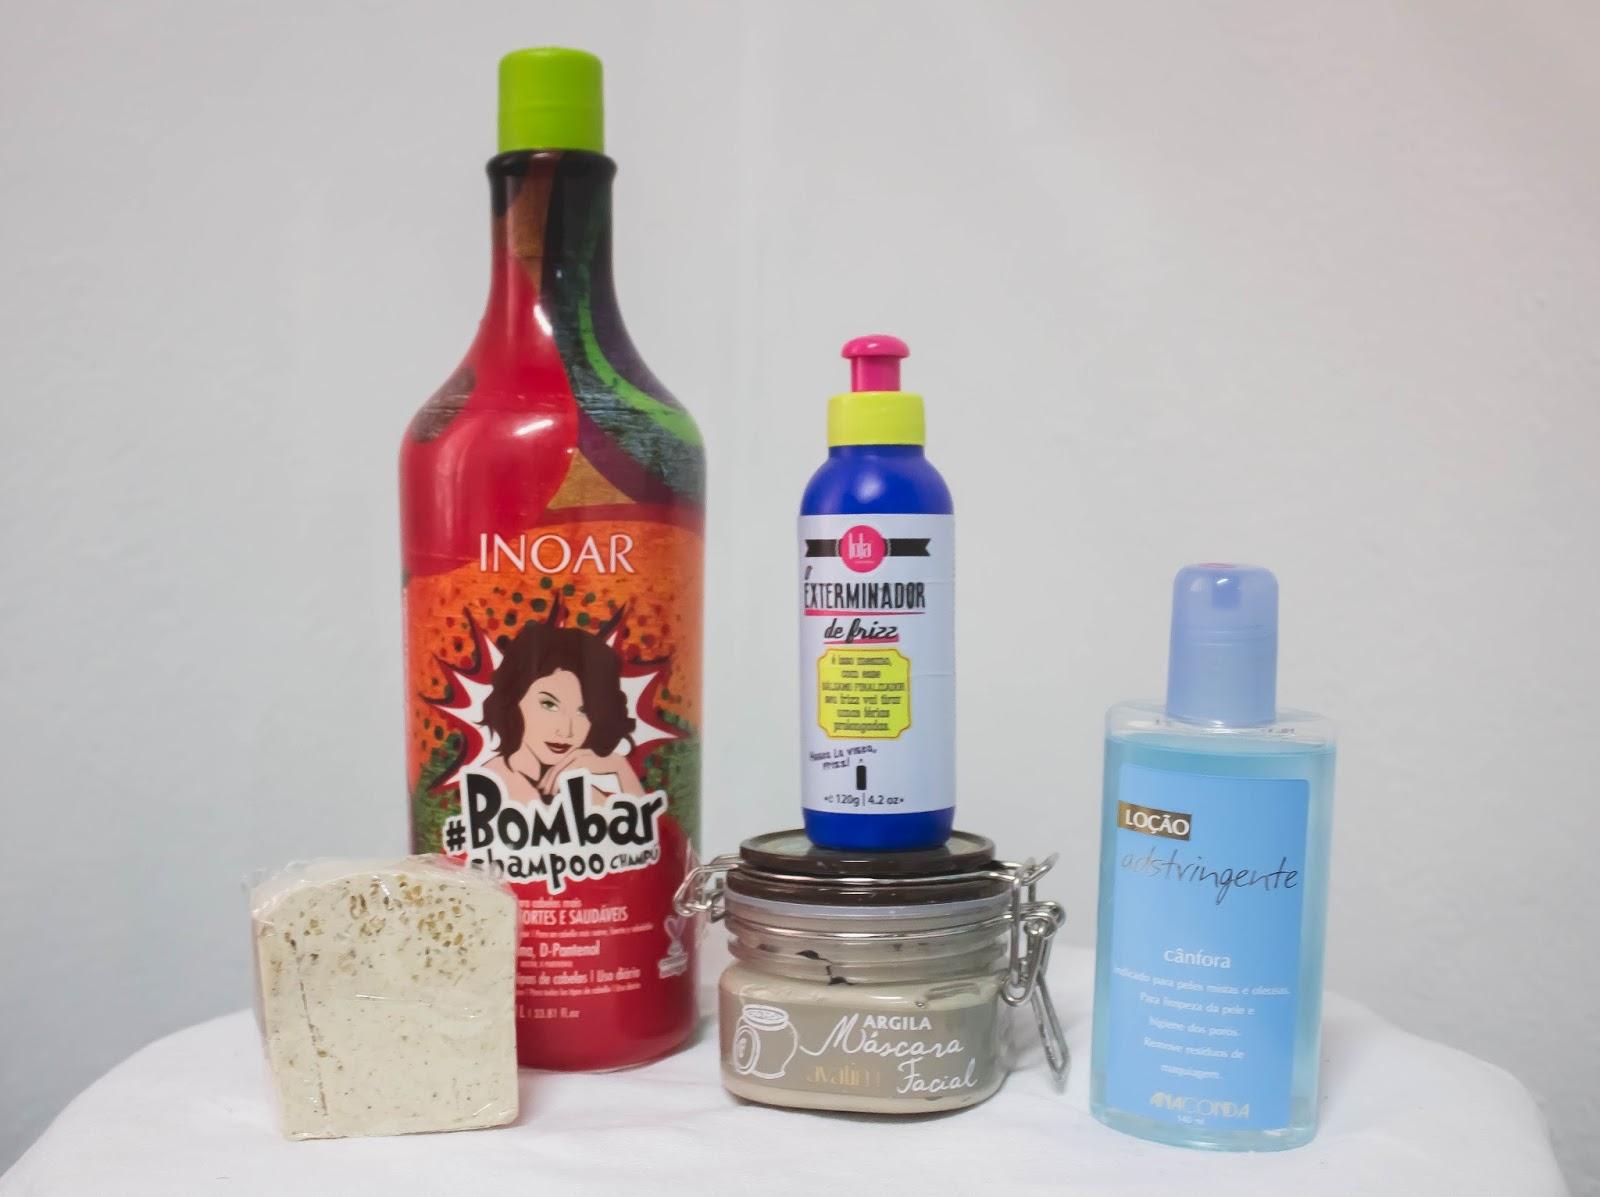 cosmeticos cruelty free